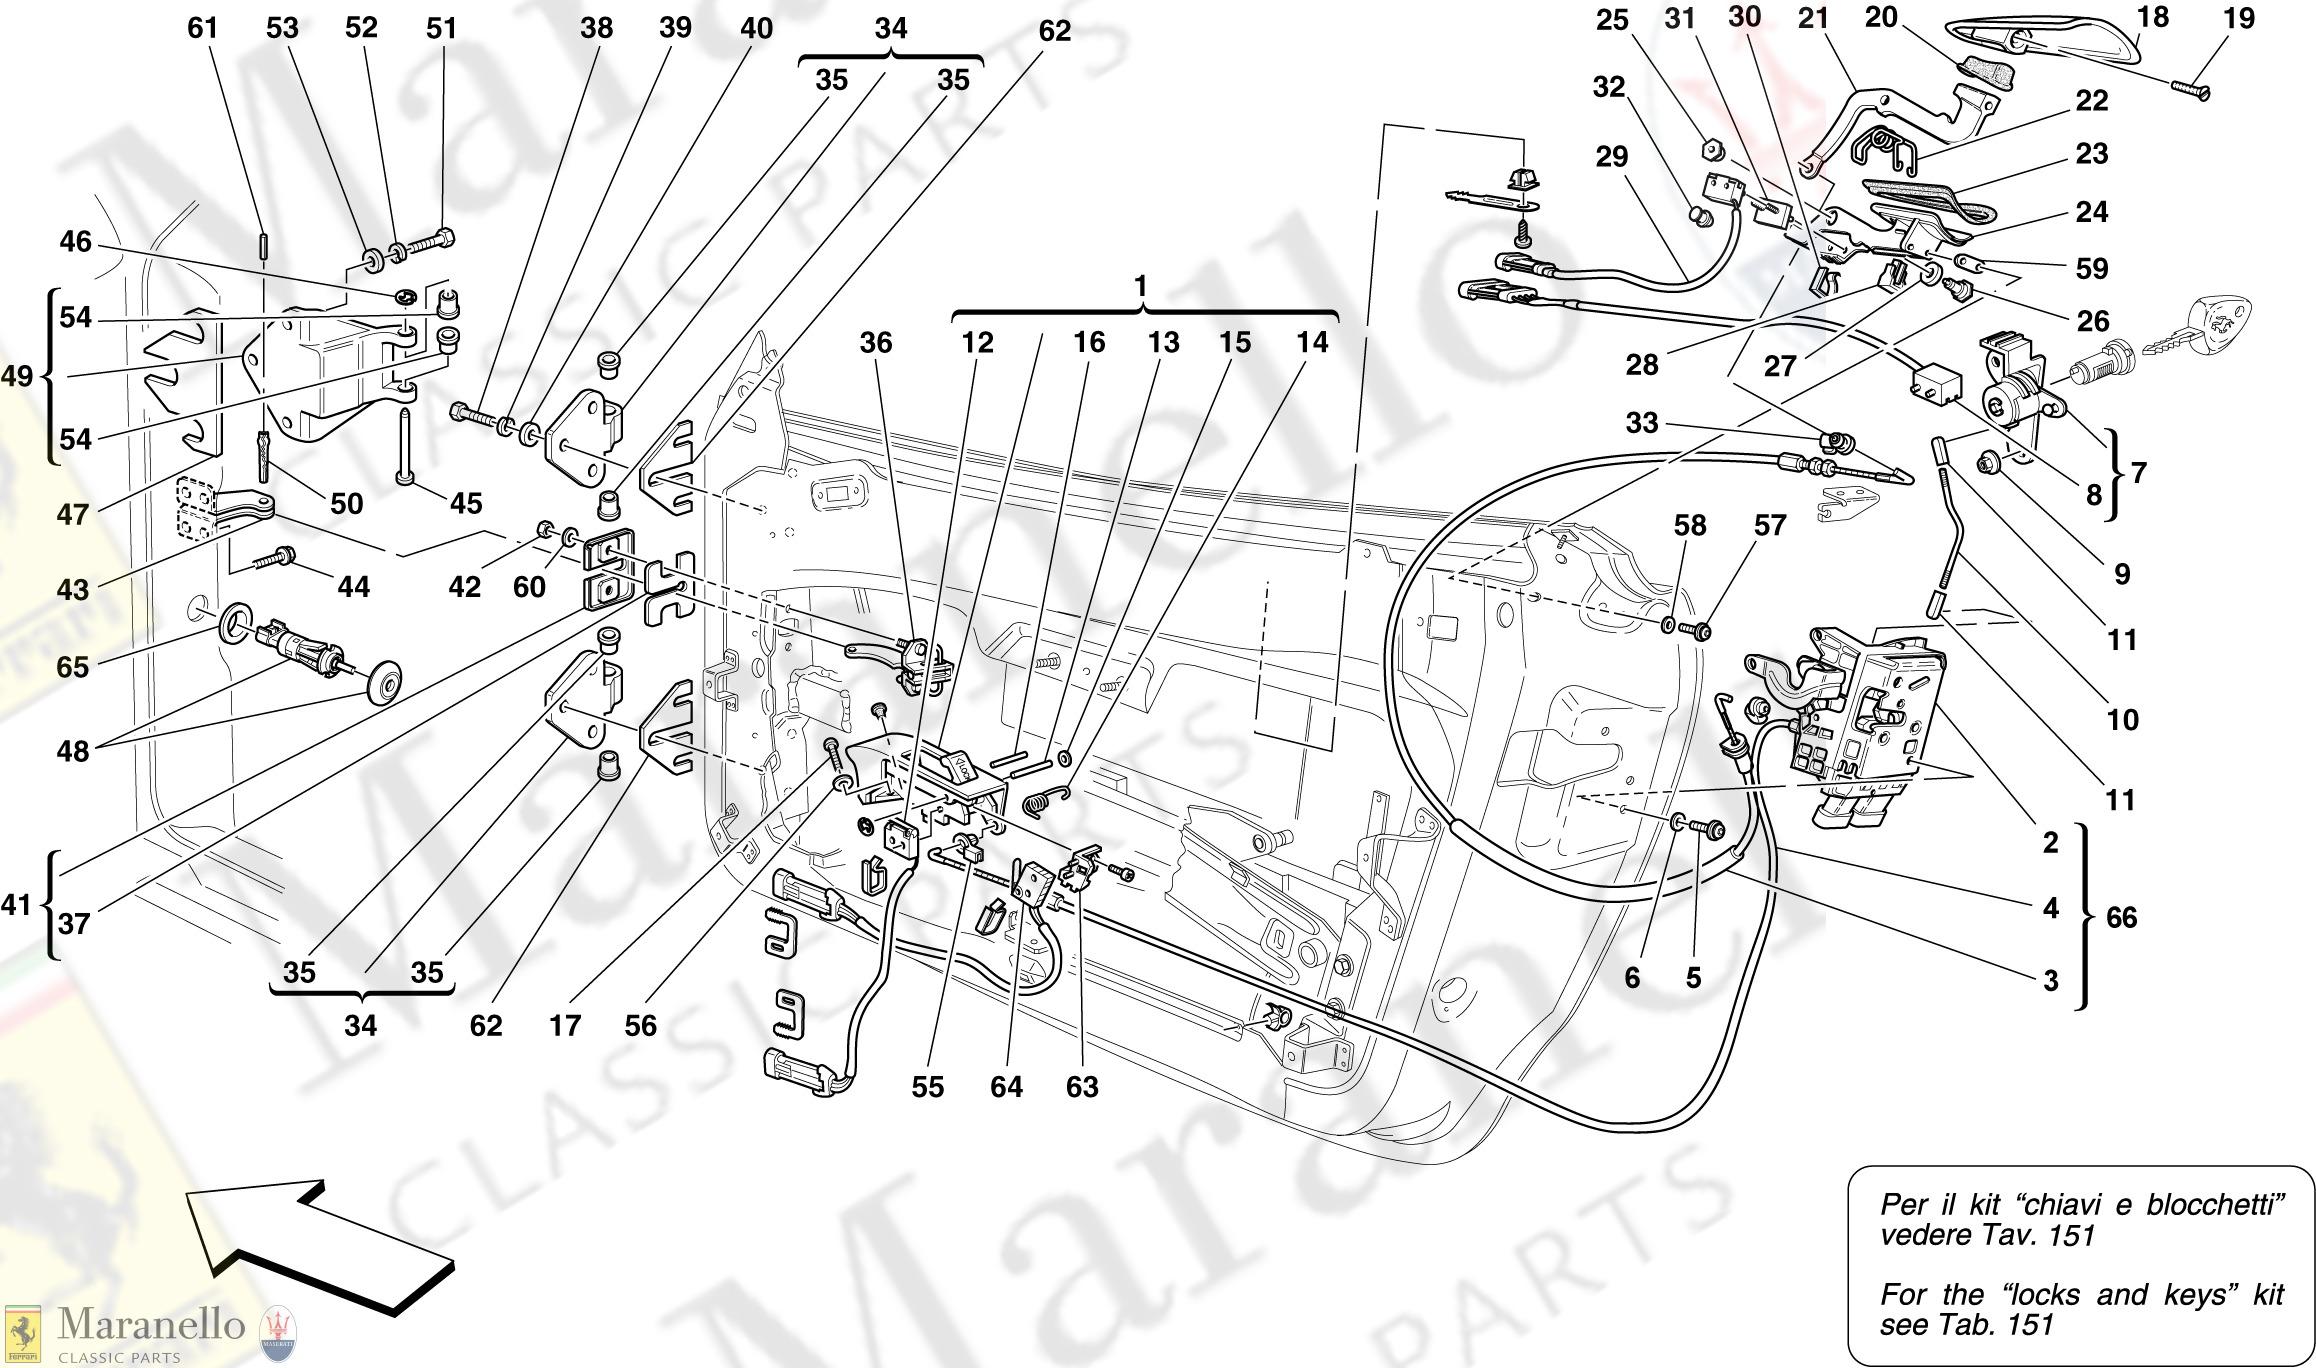 124 - Doors - Opening Mechanism And Hinges parts diagram for ... Ferrari F Spider Wiring Diagram on f355 spider, ferrari gto, ferrari california, ferrari f355, ferrari f12 berlinetta, ferrari testarossa, ferrari spyder, ferrari cars, ferrari roadster, ferrari scuderia, ferrari fxx, testarossa spider, ferrari f440, ferrari f40, ferrari 612 scaglietti,